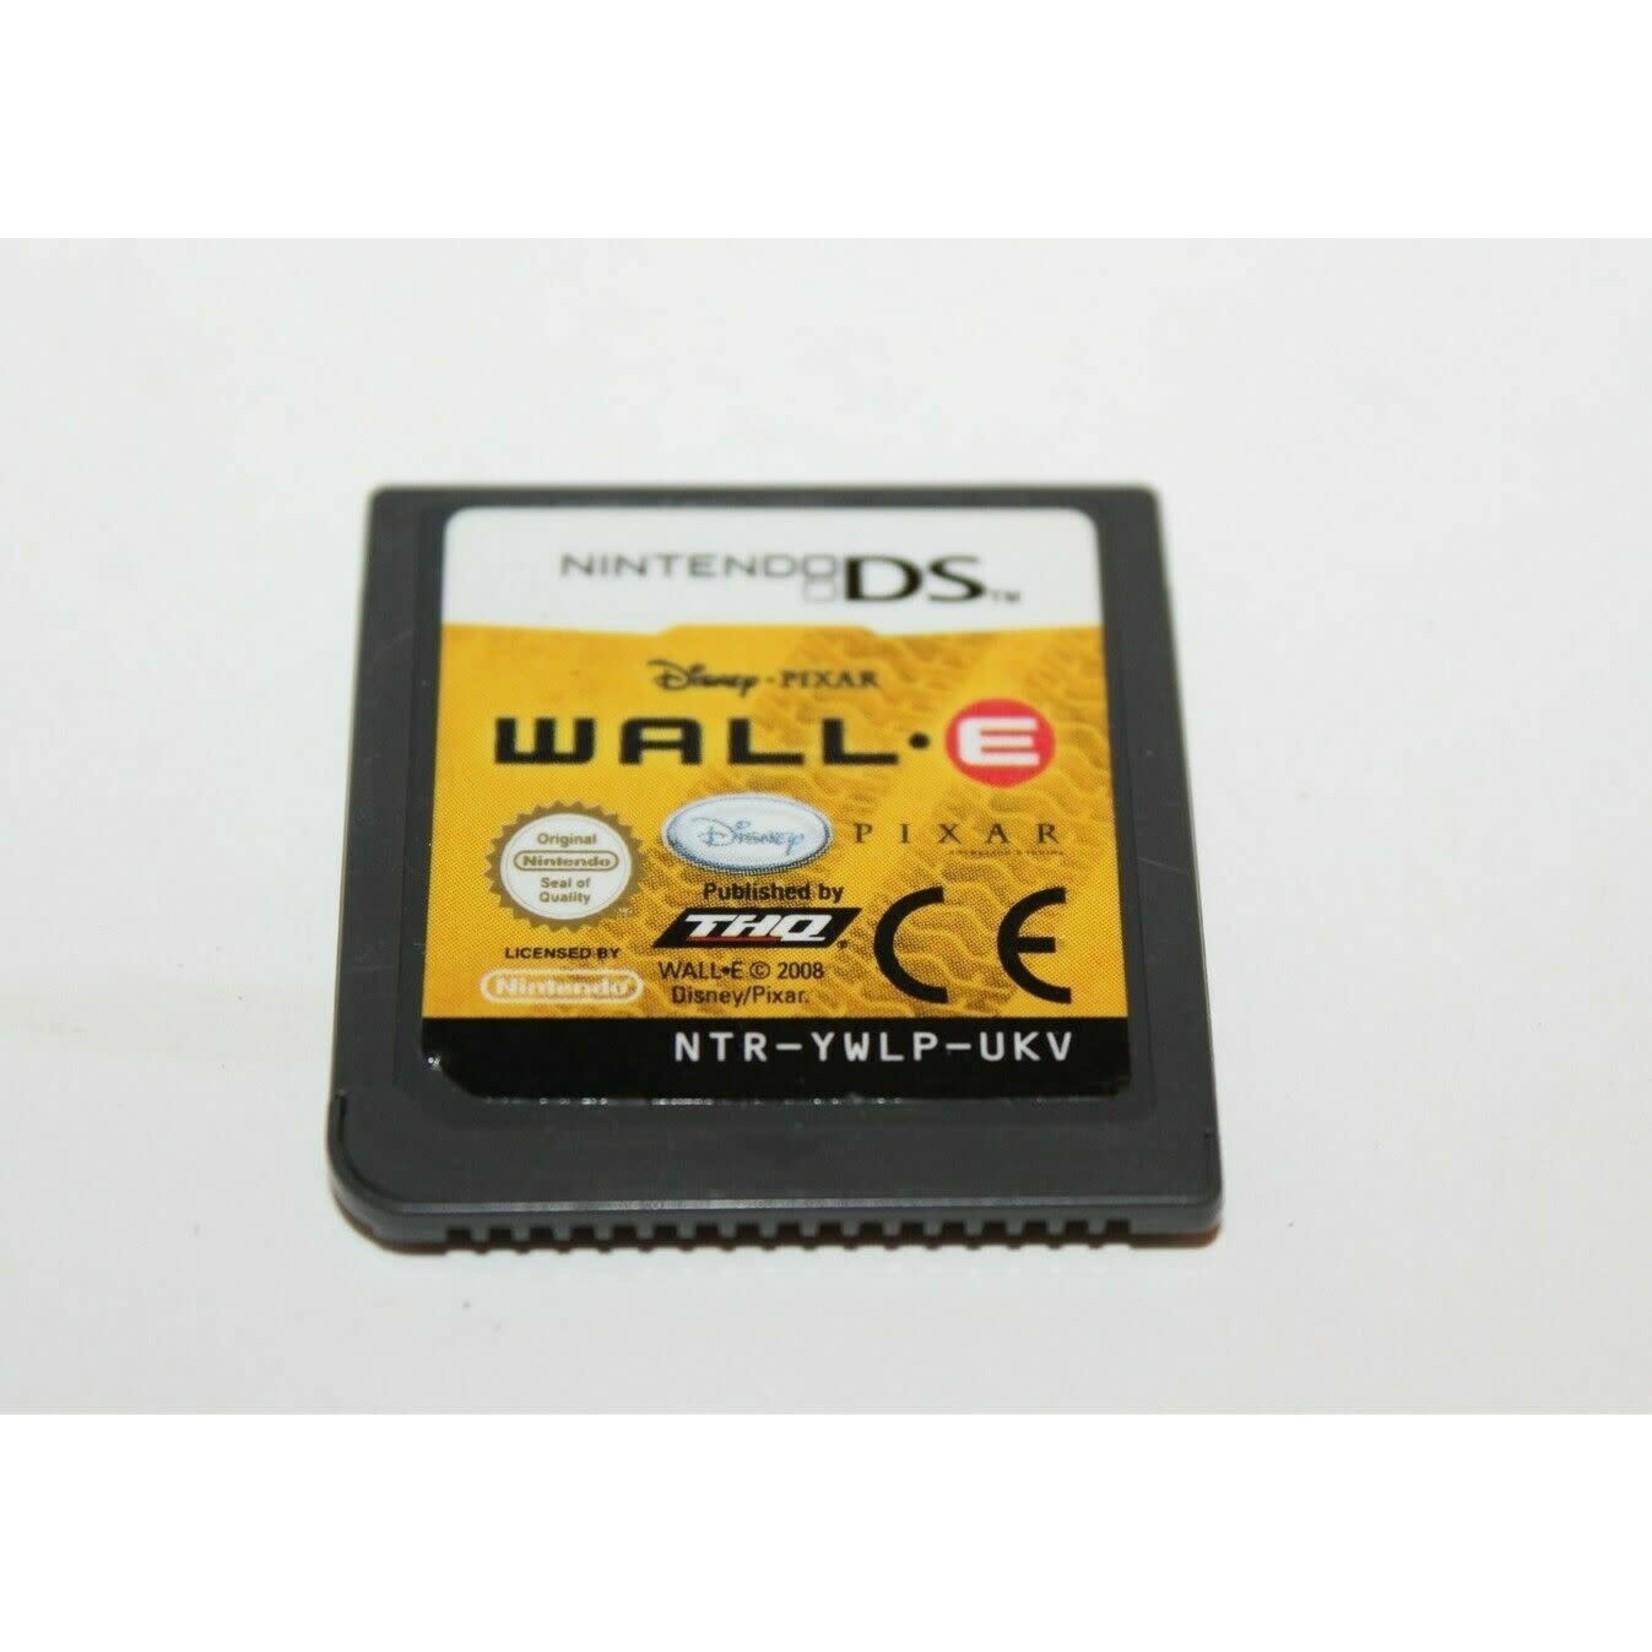 DSU-Wall-e (chip only)